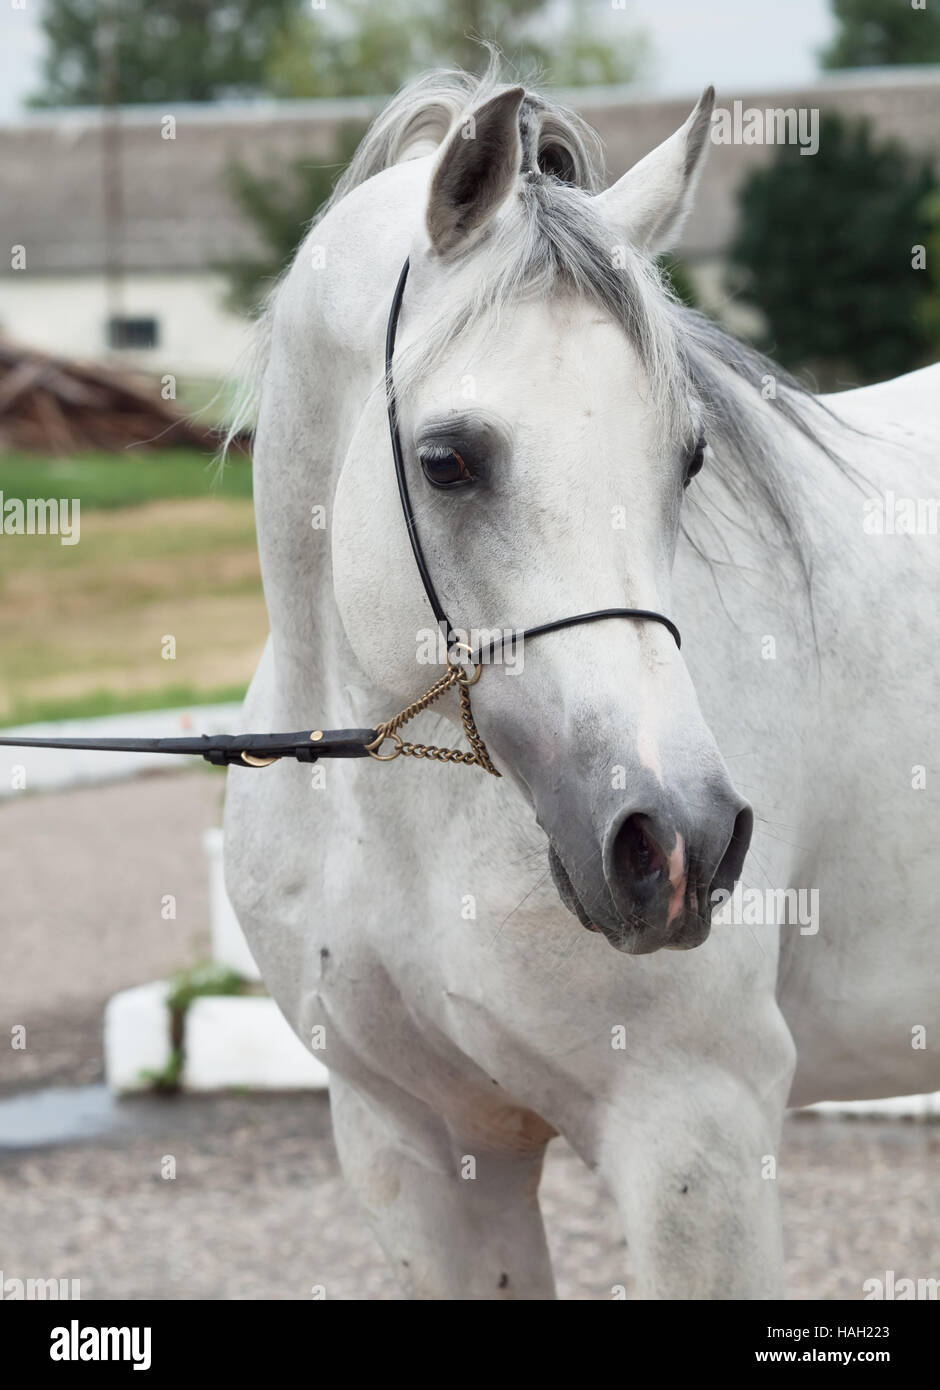 portrait of white arabian horse. close up - Stock Image